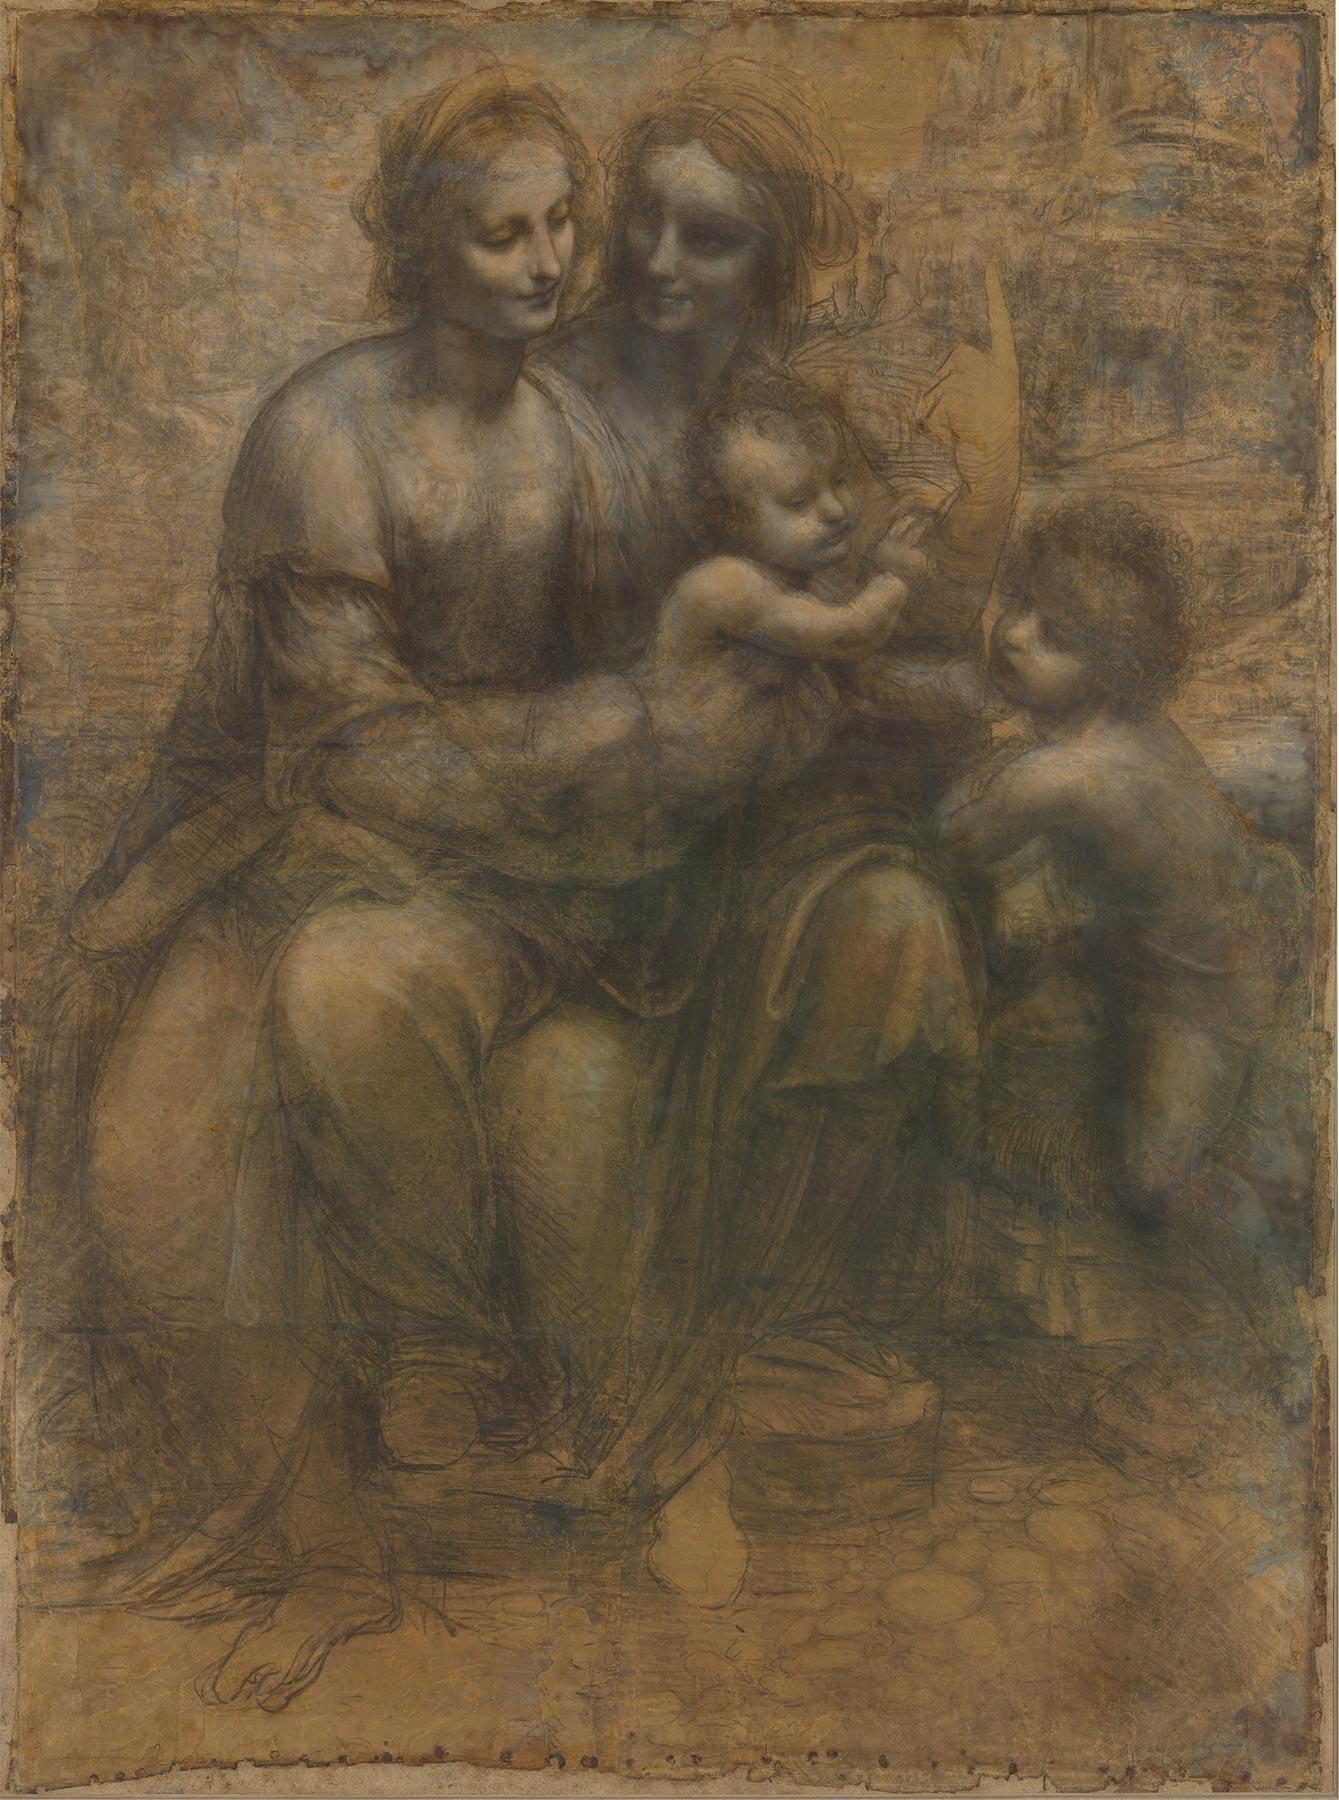 Leonardo da Vinci, Cartone di sant'Anna (1500-1505 circa; gessetto nero e biacca su carta, 1415 x 1046 mm; Londra, National Gallery)